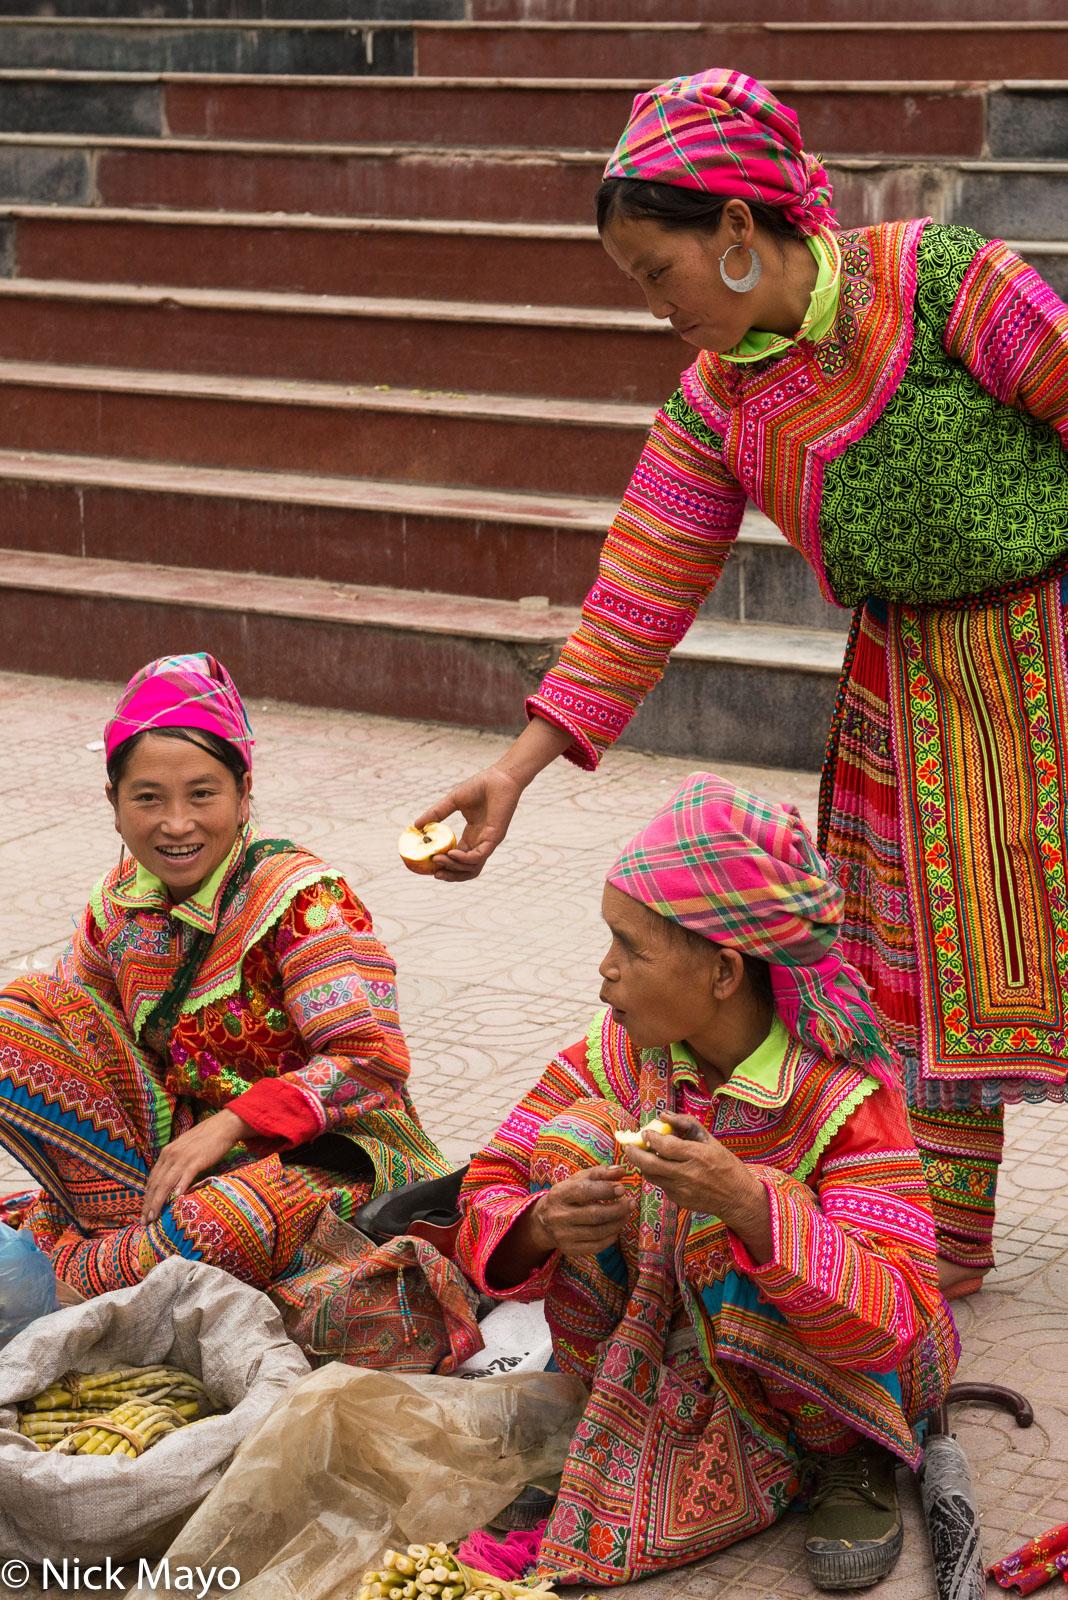 Earring, Ha Giang, Head Scarf, Leggings, Market, Miao, Selling, Vietnam, photo